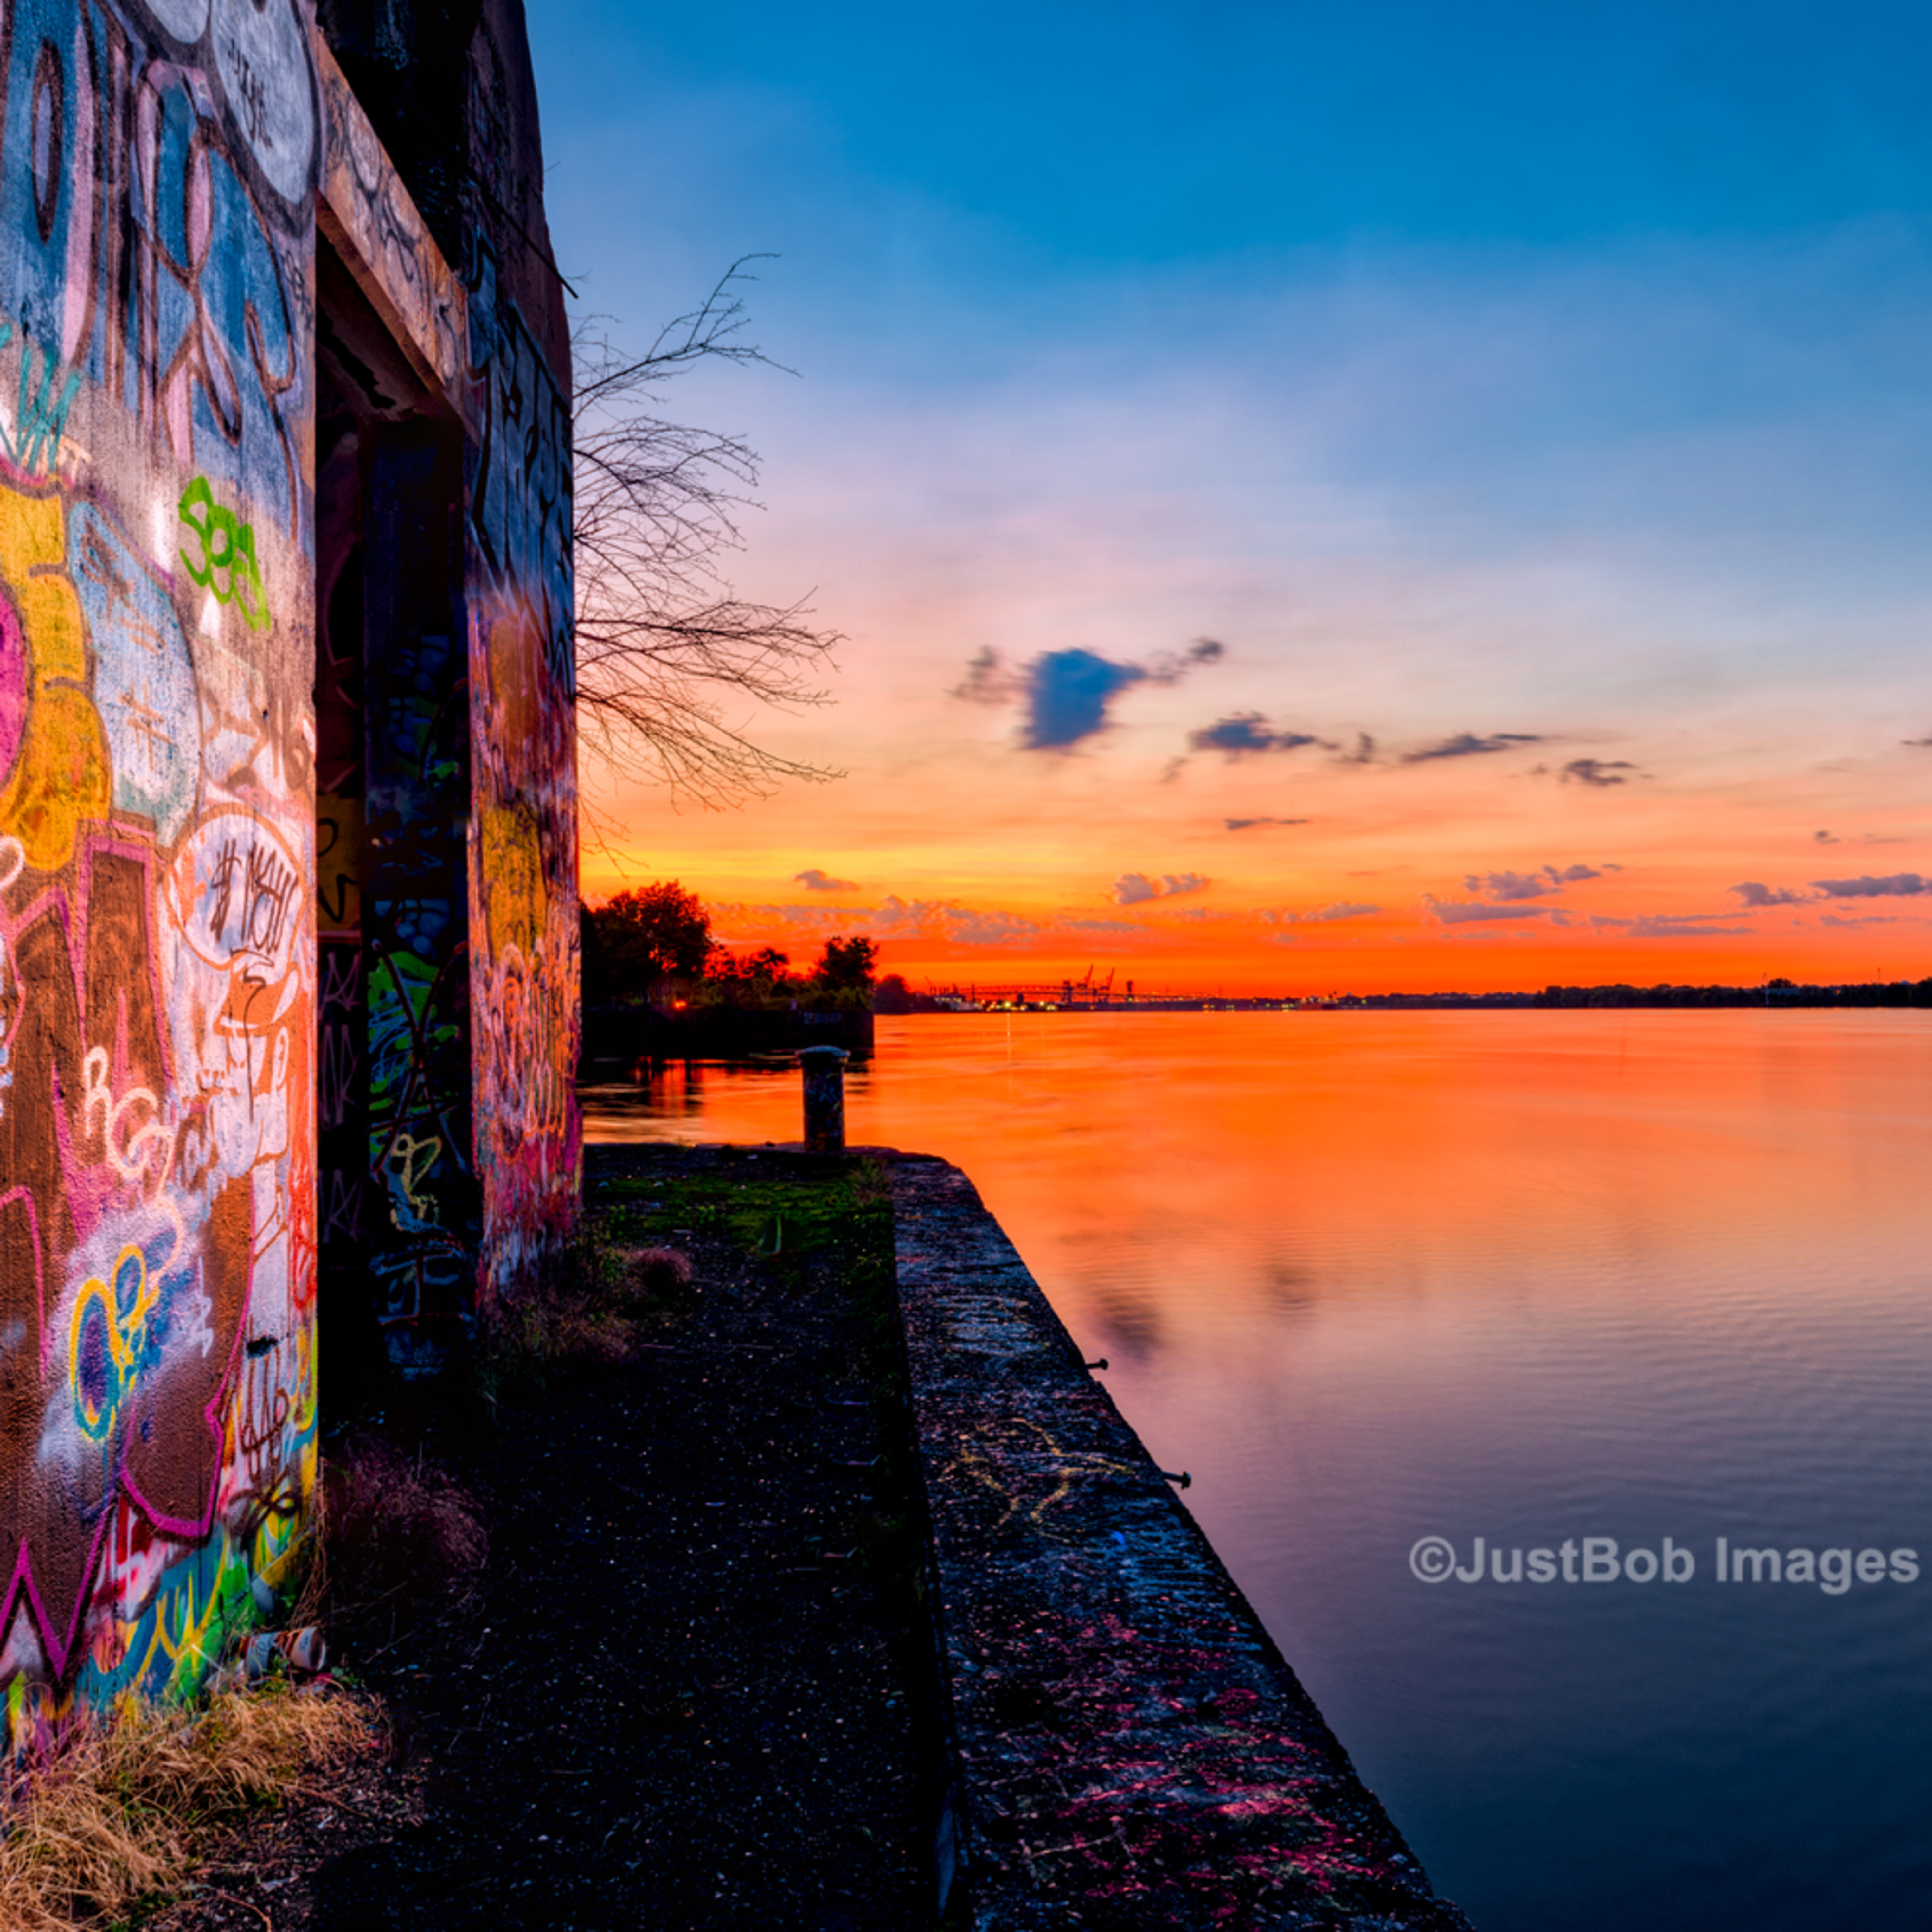 Graffiti 20160611 0001 aurorahdr hdr edit zwjzho